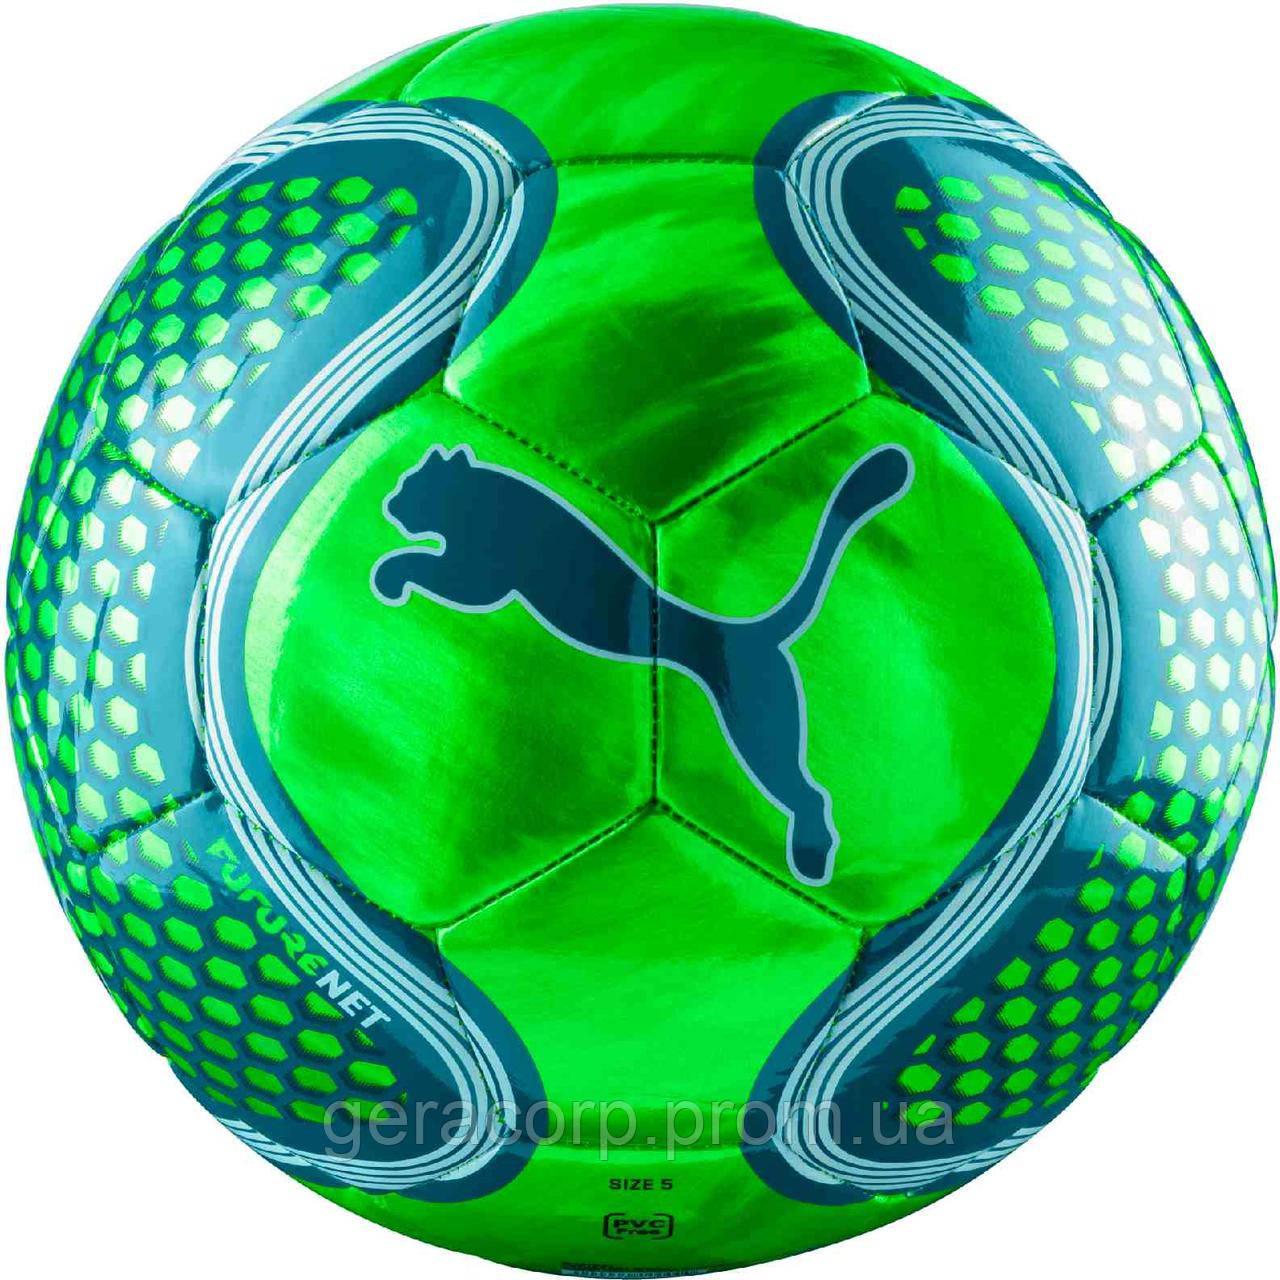 Мяч Puma Future net ball green size 5